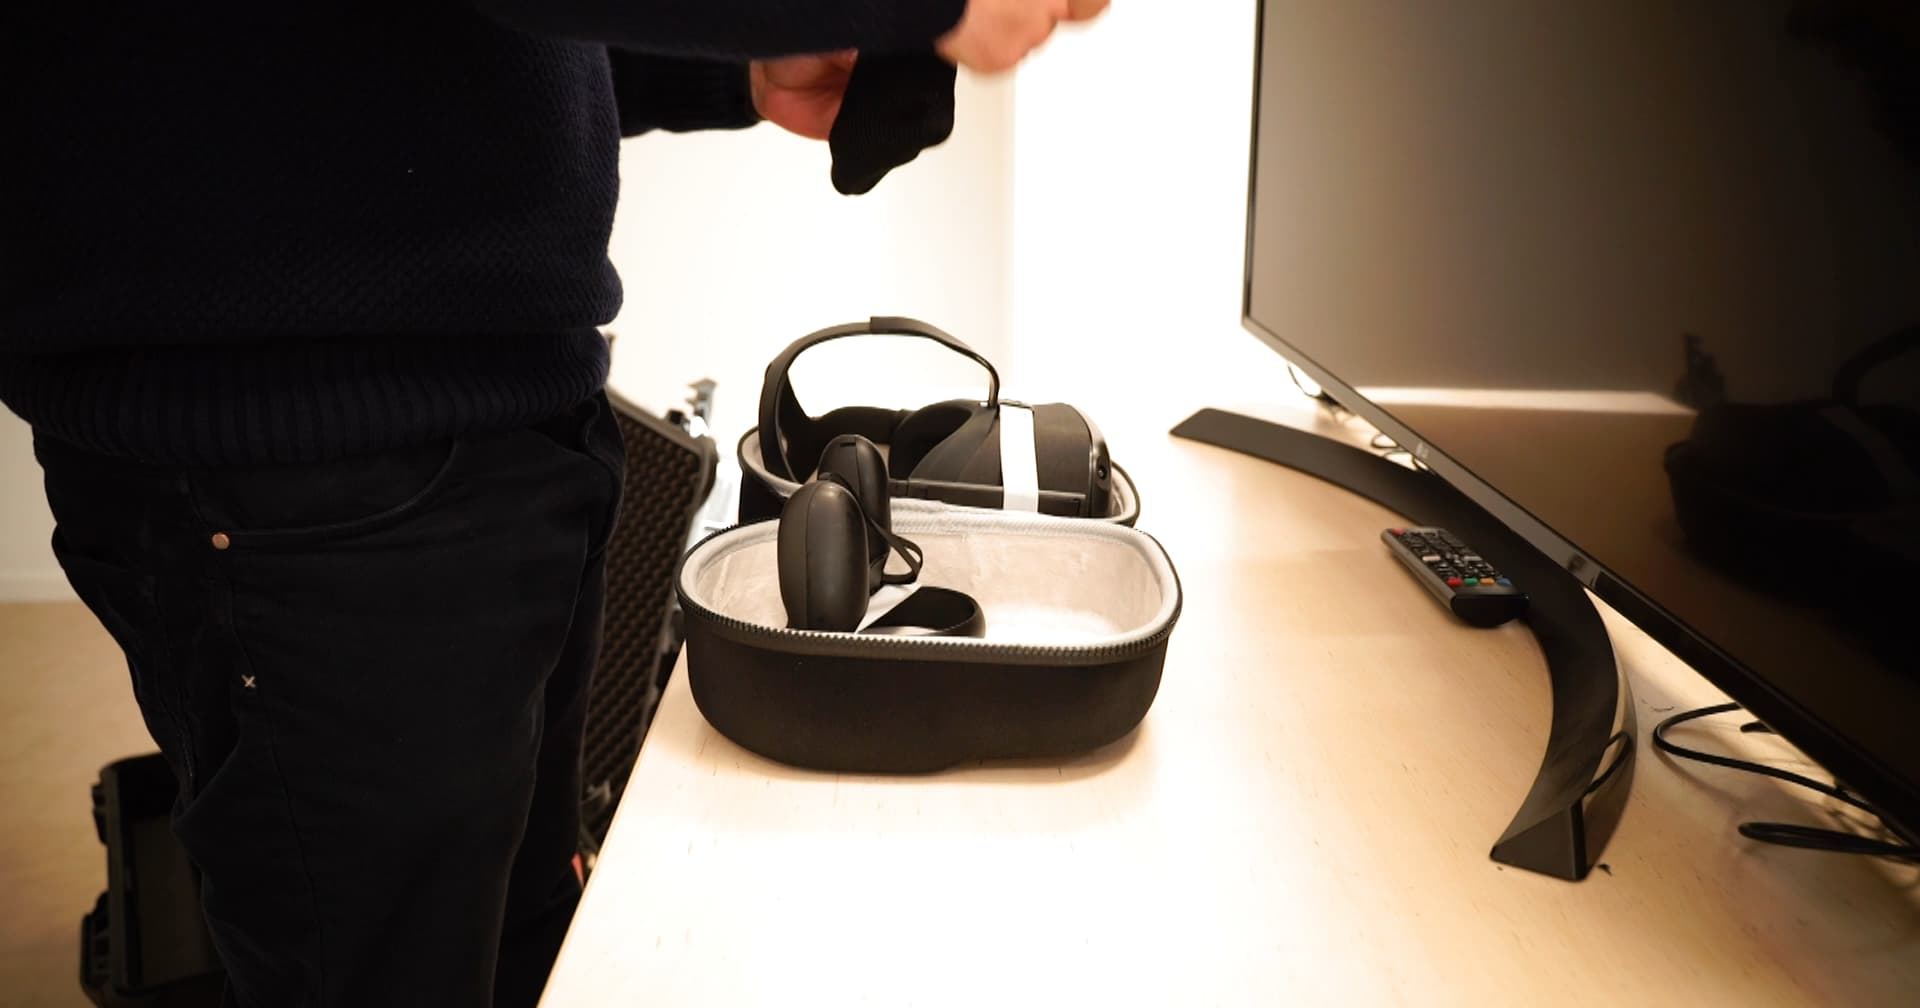 fire extinguisher VR